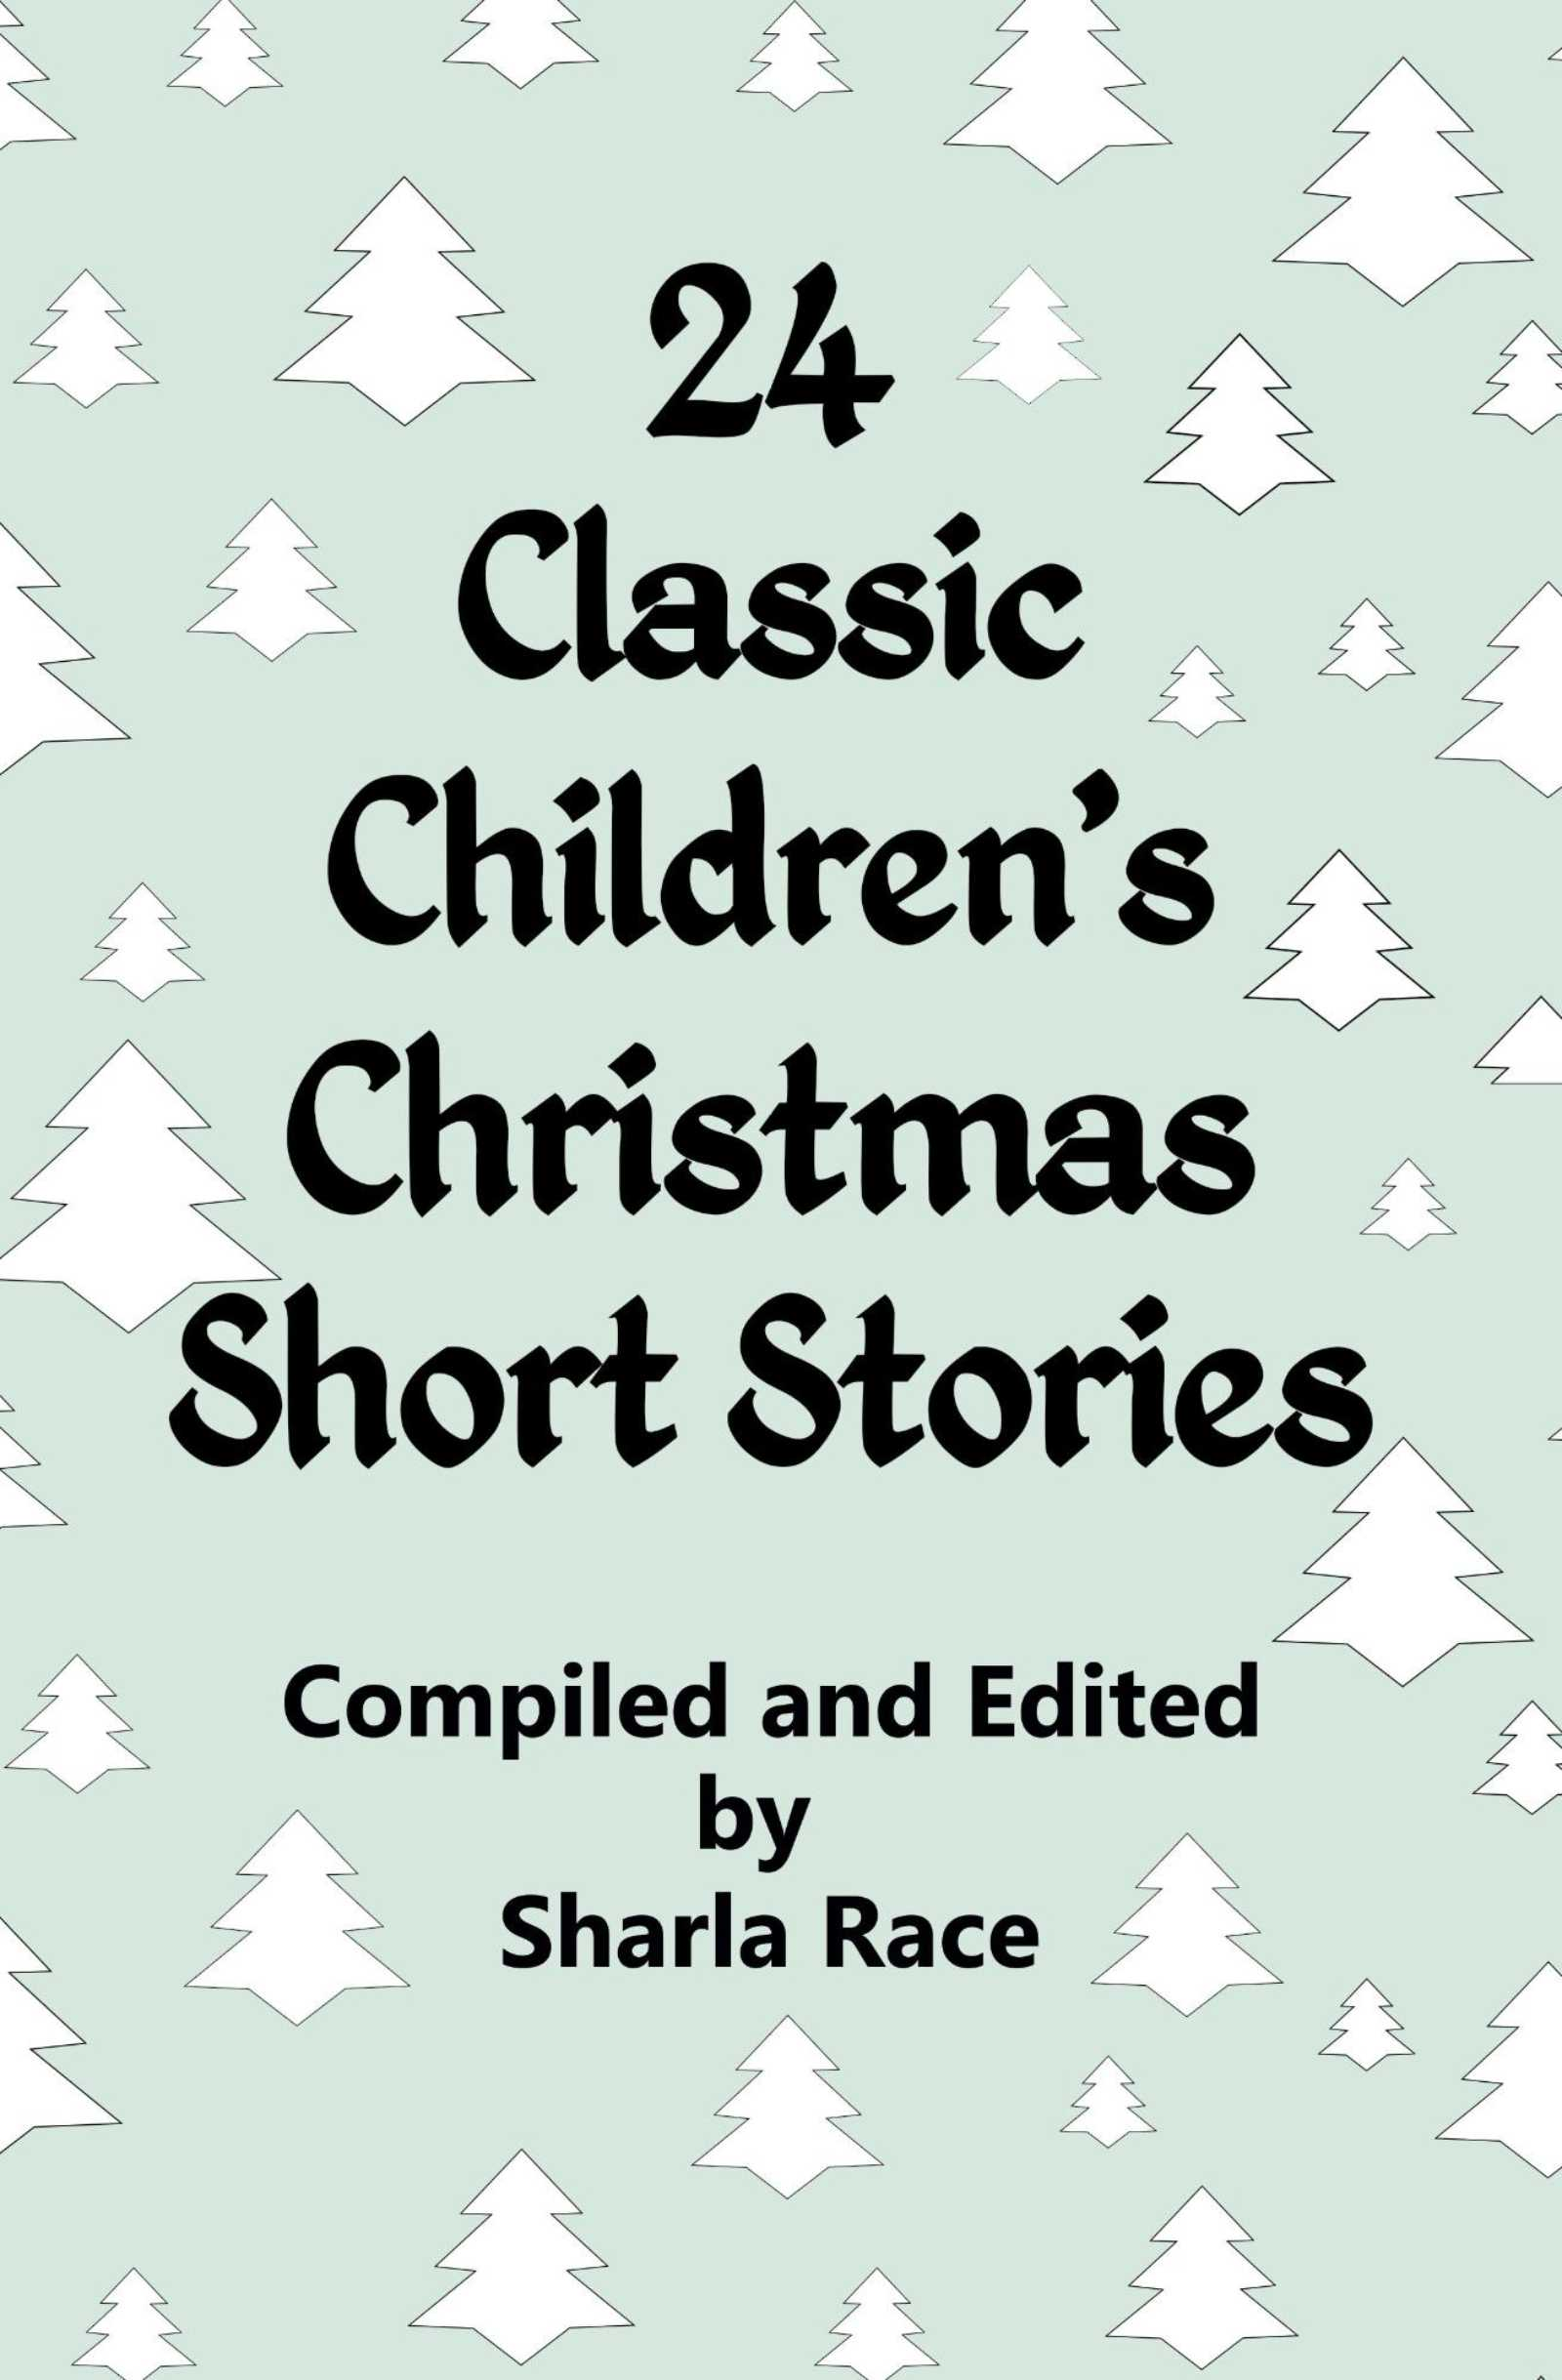 Christmas Short Stories.24 Classic Children S Christmas Short Stories An Ebook By Sharla Race